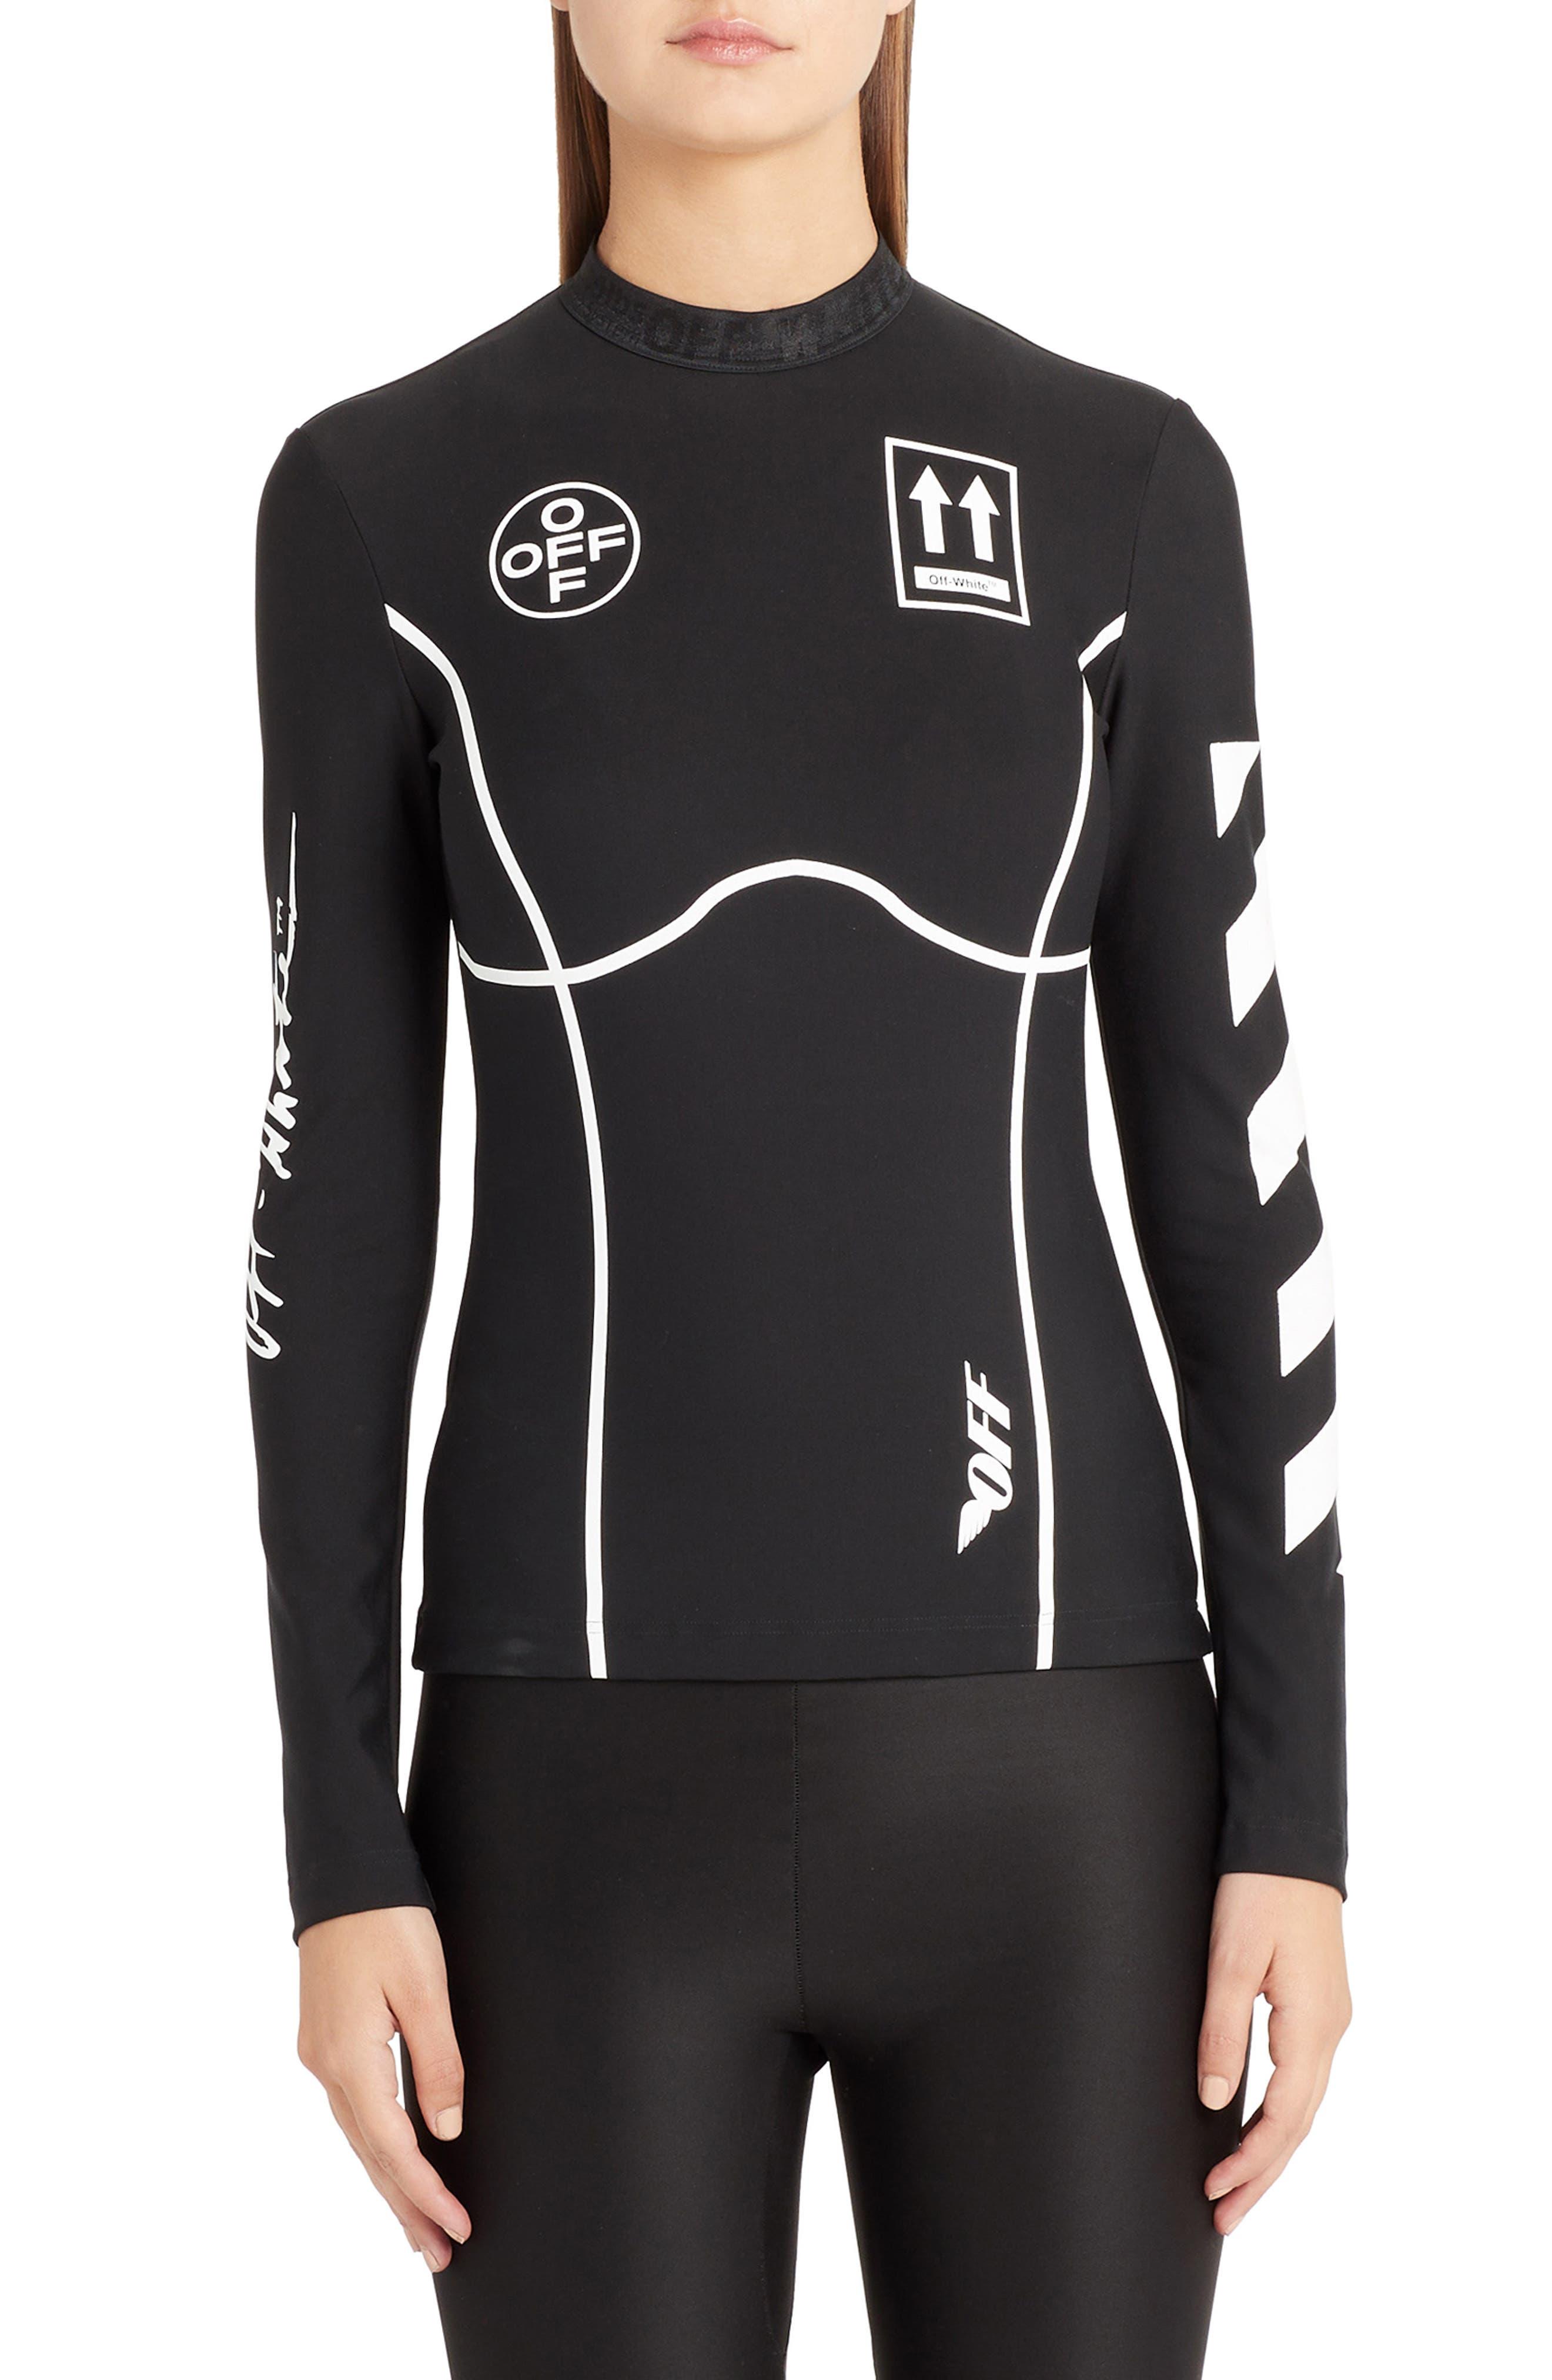 OFF-WHITE Diagonal Stripe Sport Top, Main, color, BLACK WHITE